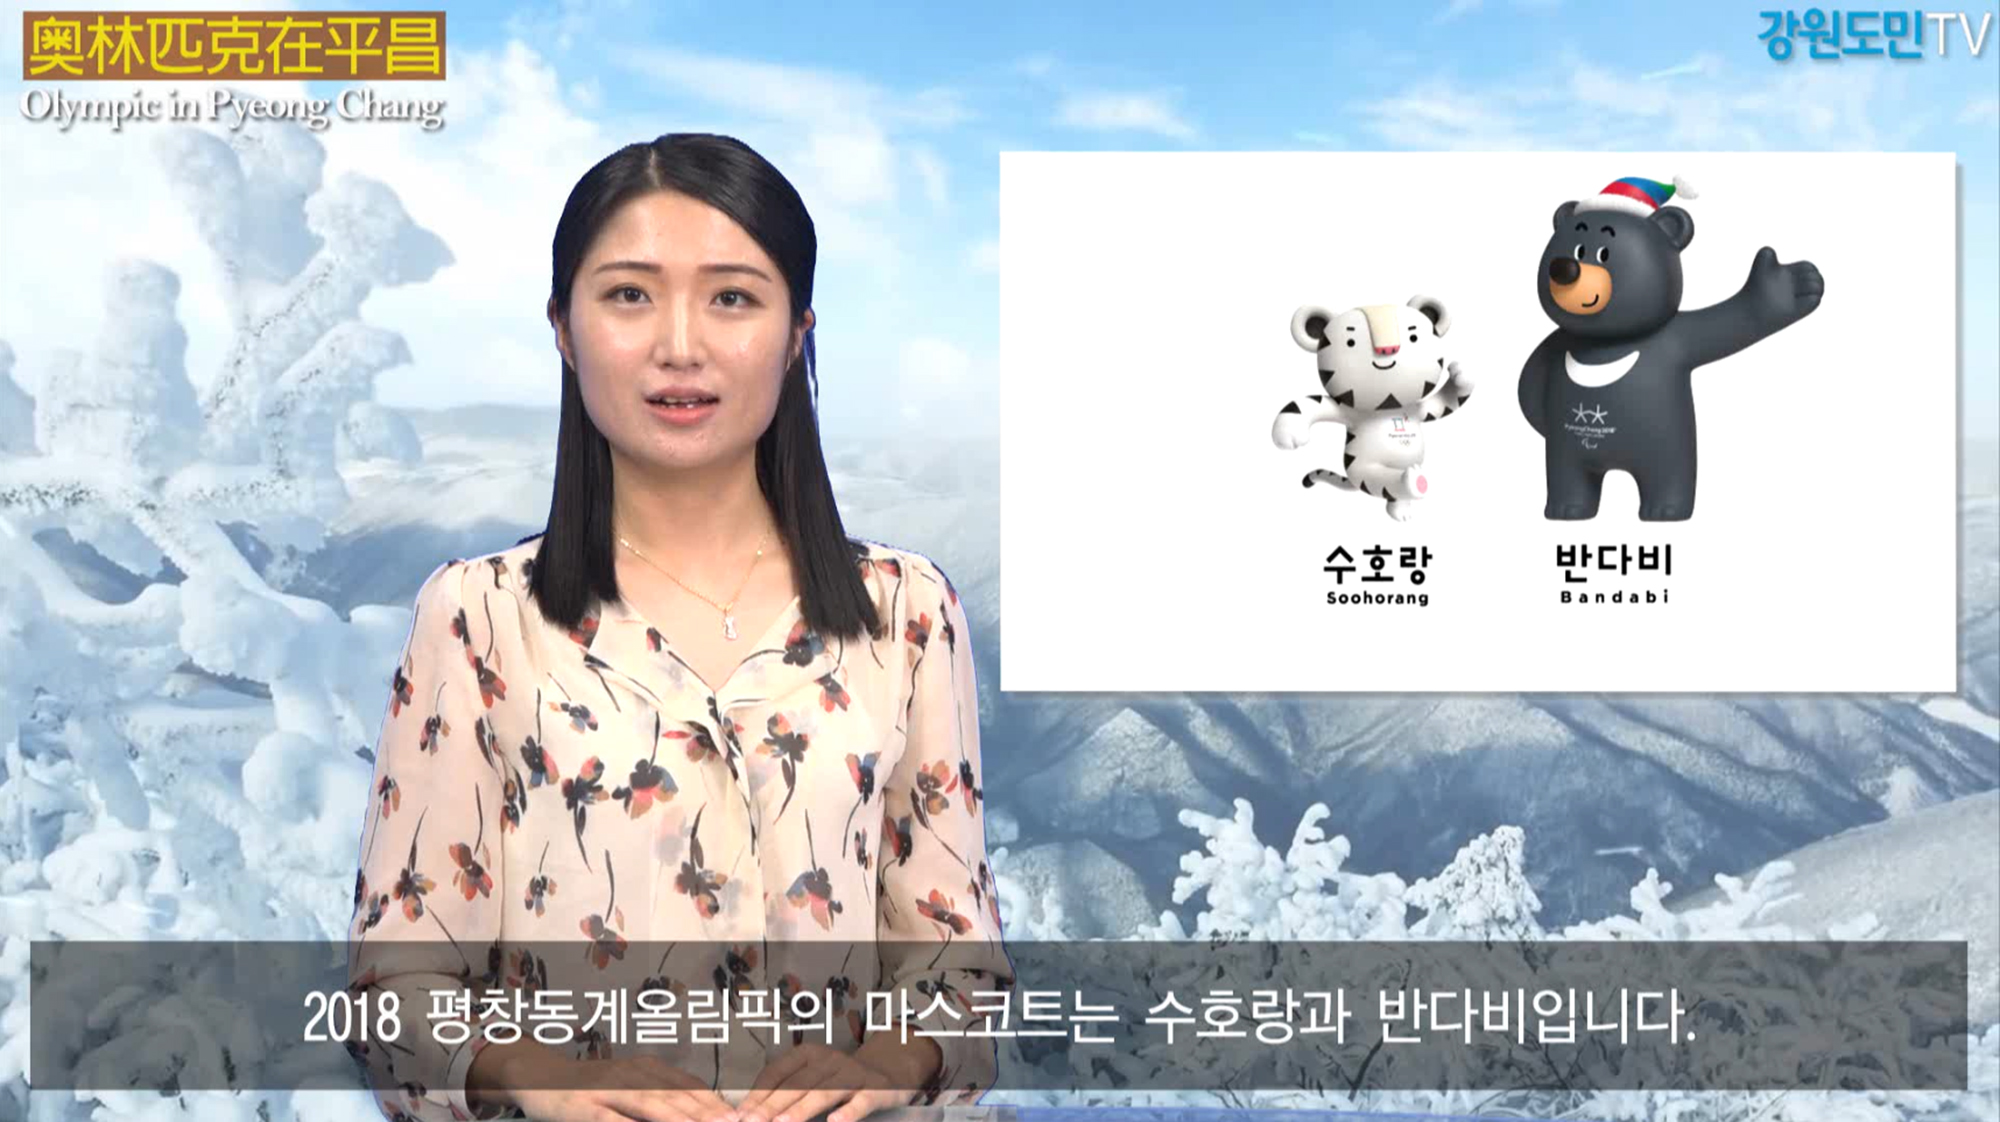 Olympic in Pyeong chang (평창동계올림픽 마스코트)